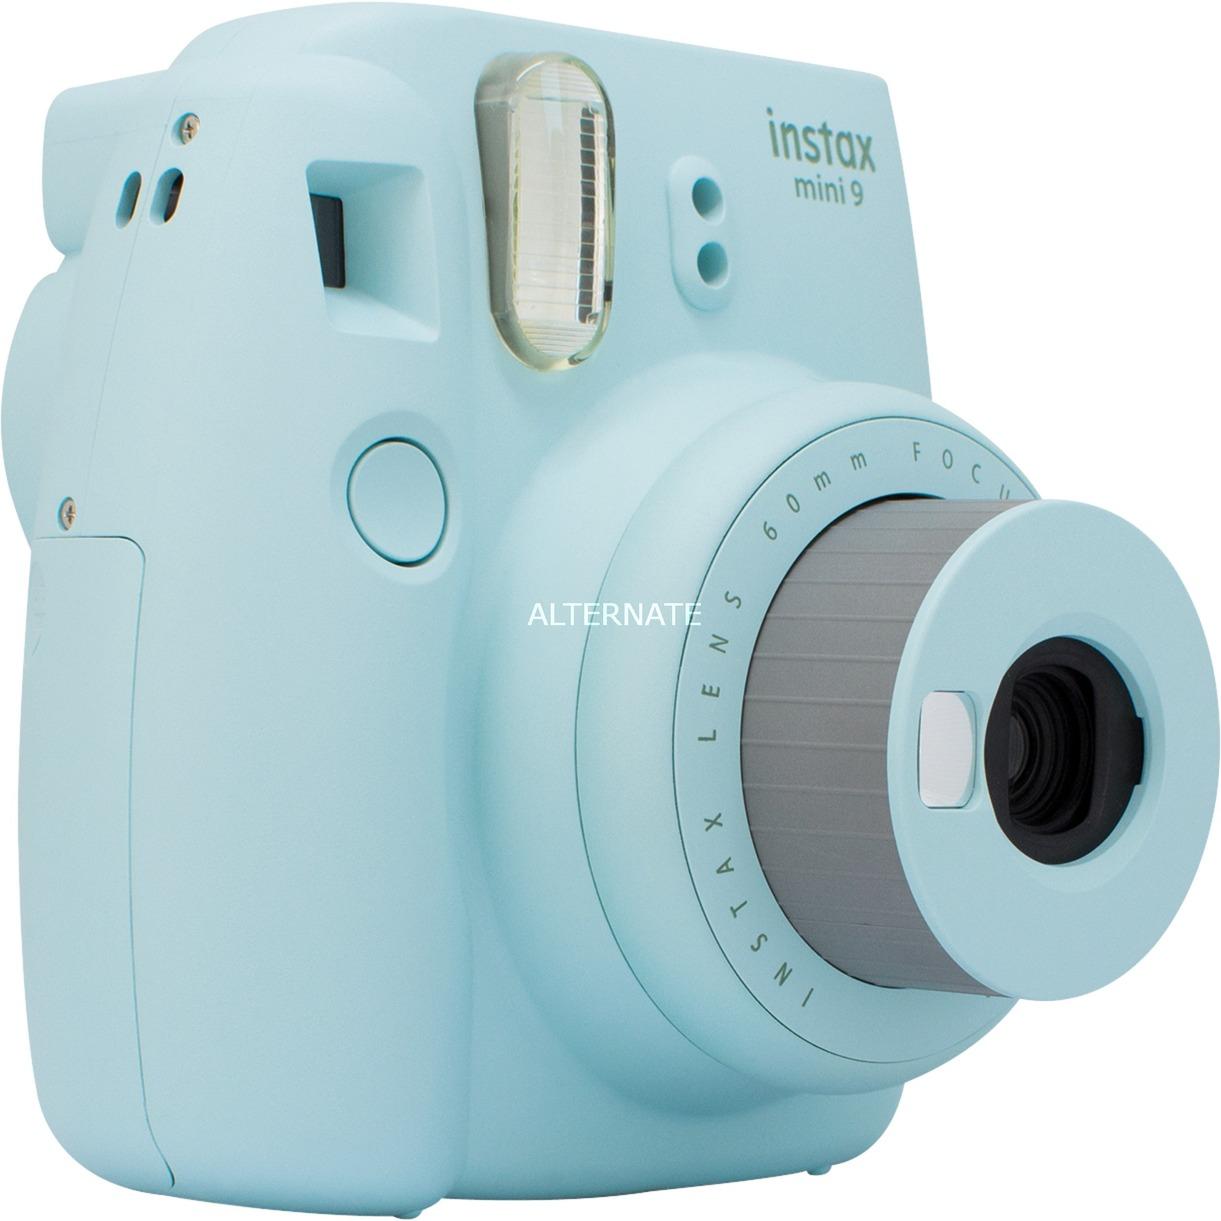 Instax Mini 9 62 x 46mm Azul cámara instantánea impresión